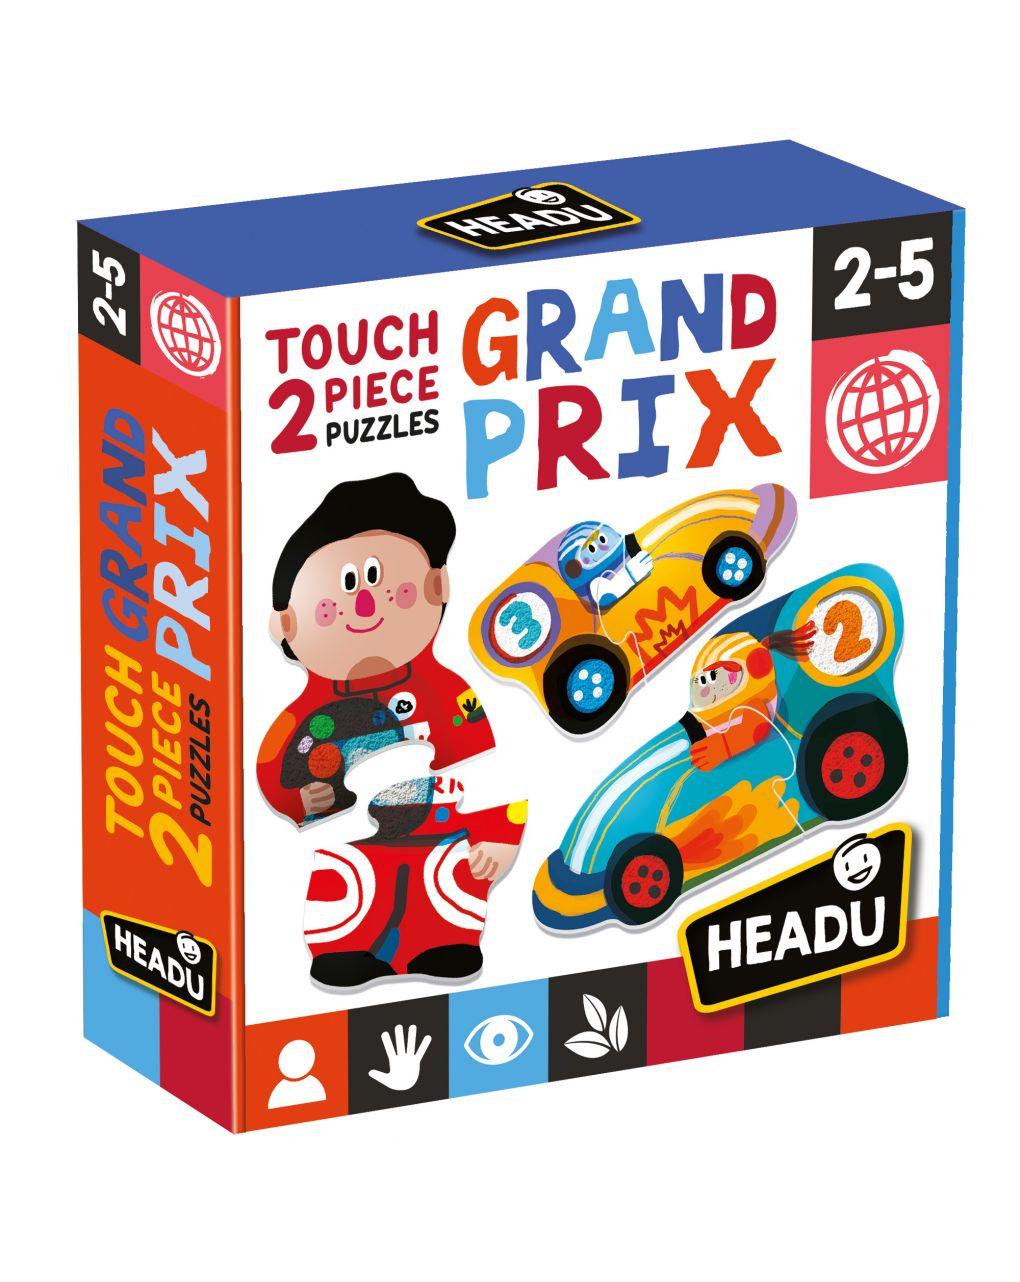 Headu - 2 pieces touch  puzzle grand prix - Headu